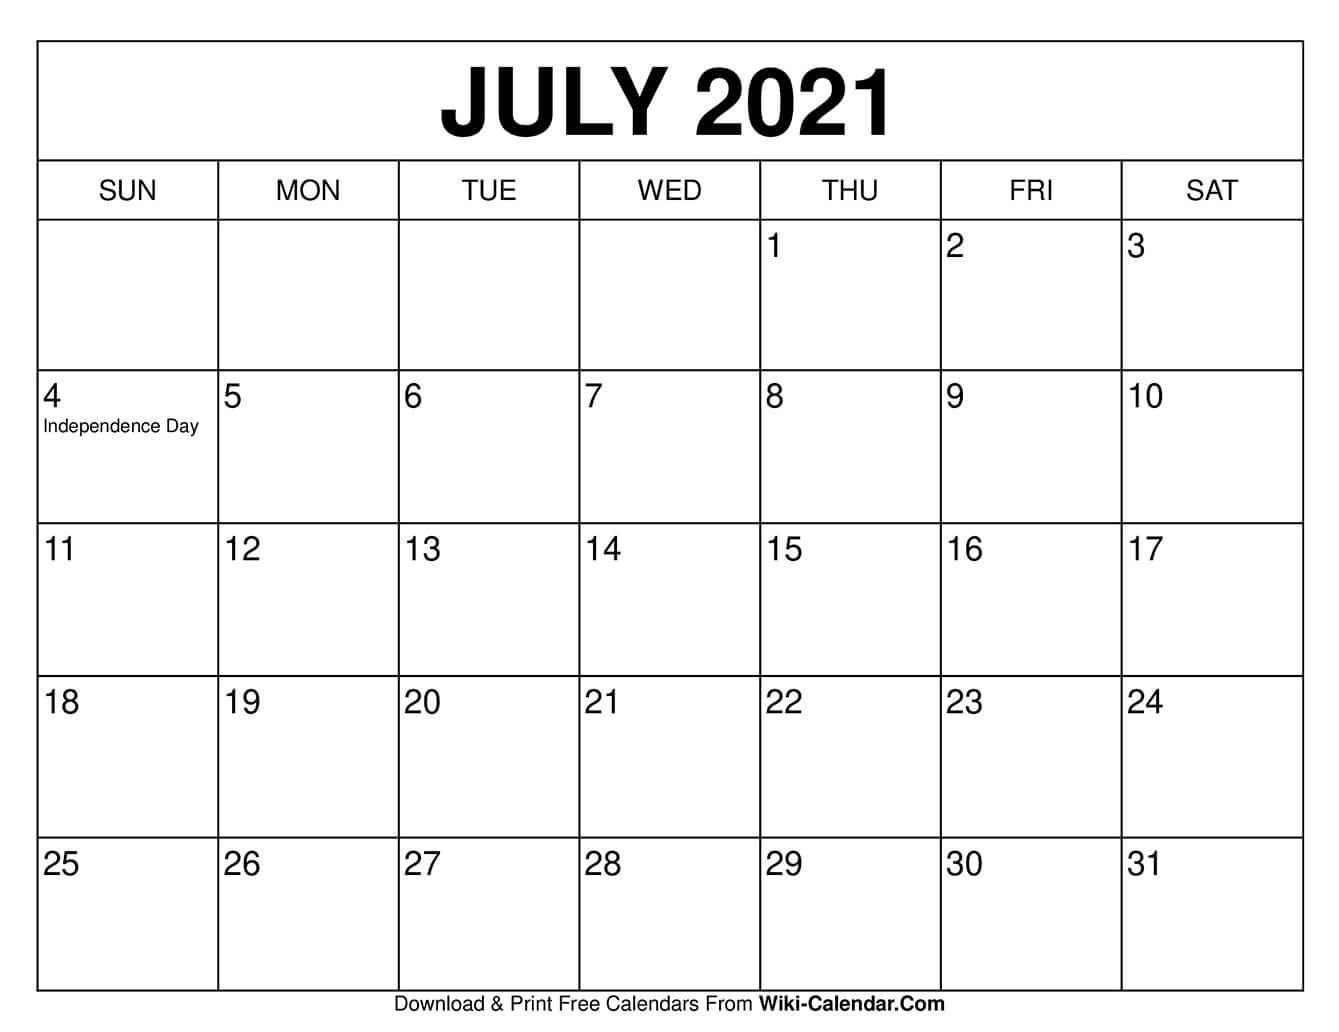 July 2021 Calendar - Free Download Printable Calendar Templates-Free Fillable Calendars 2021